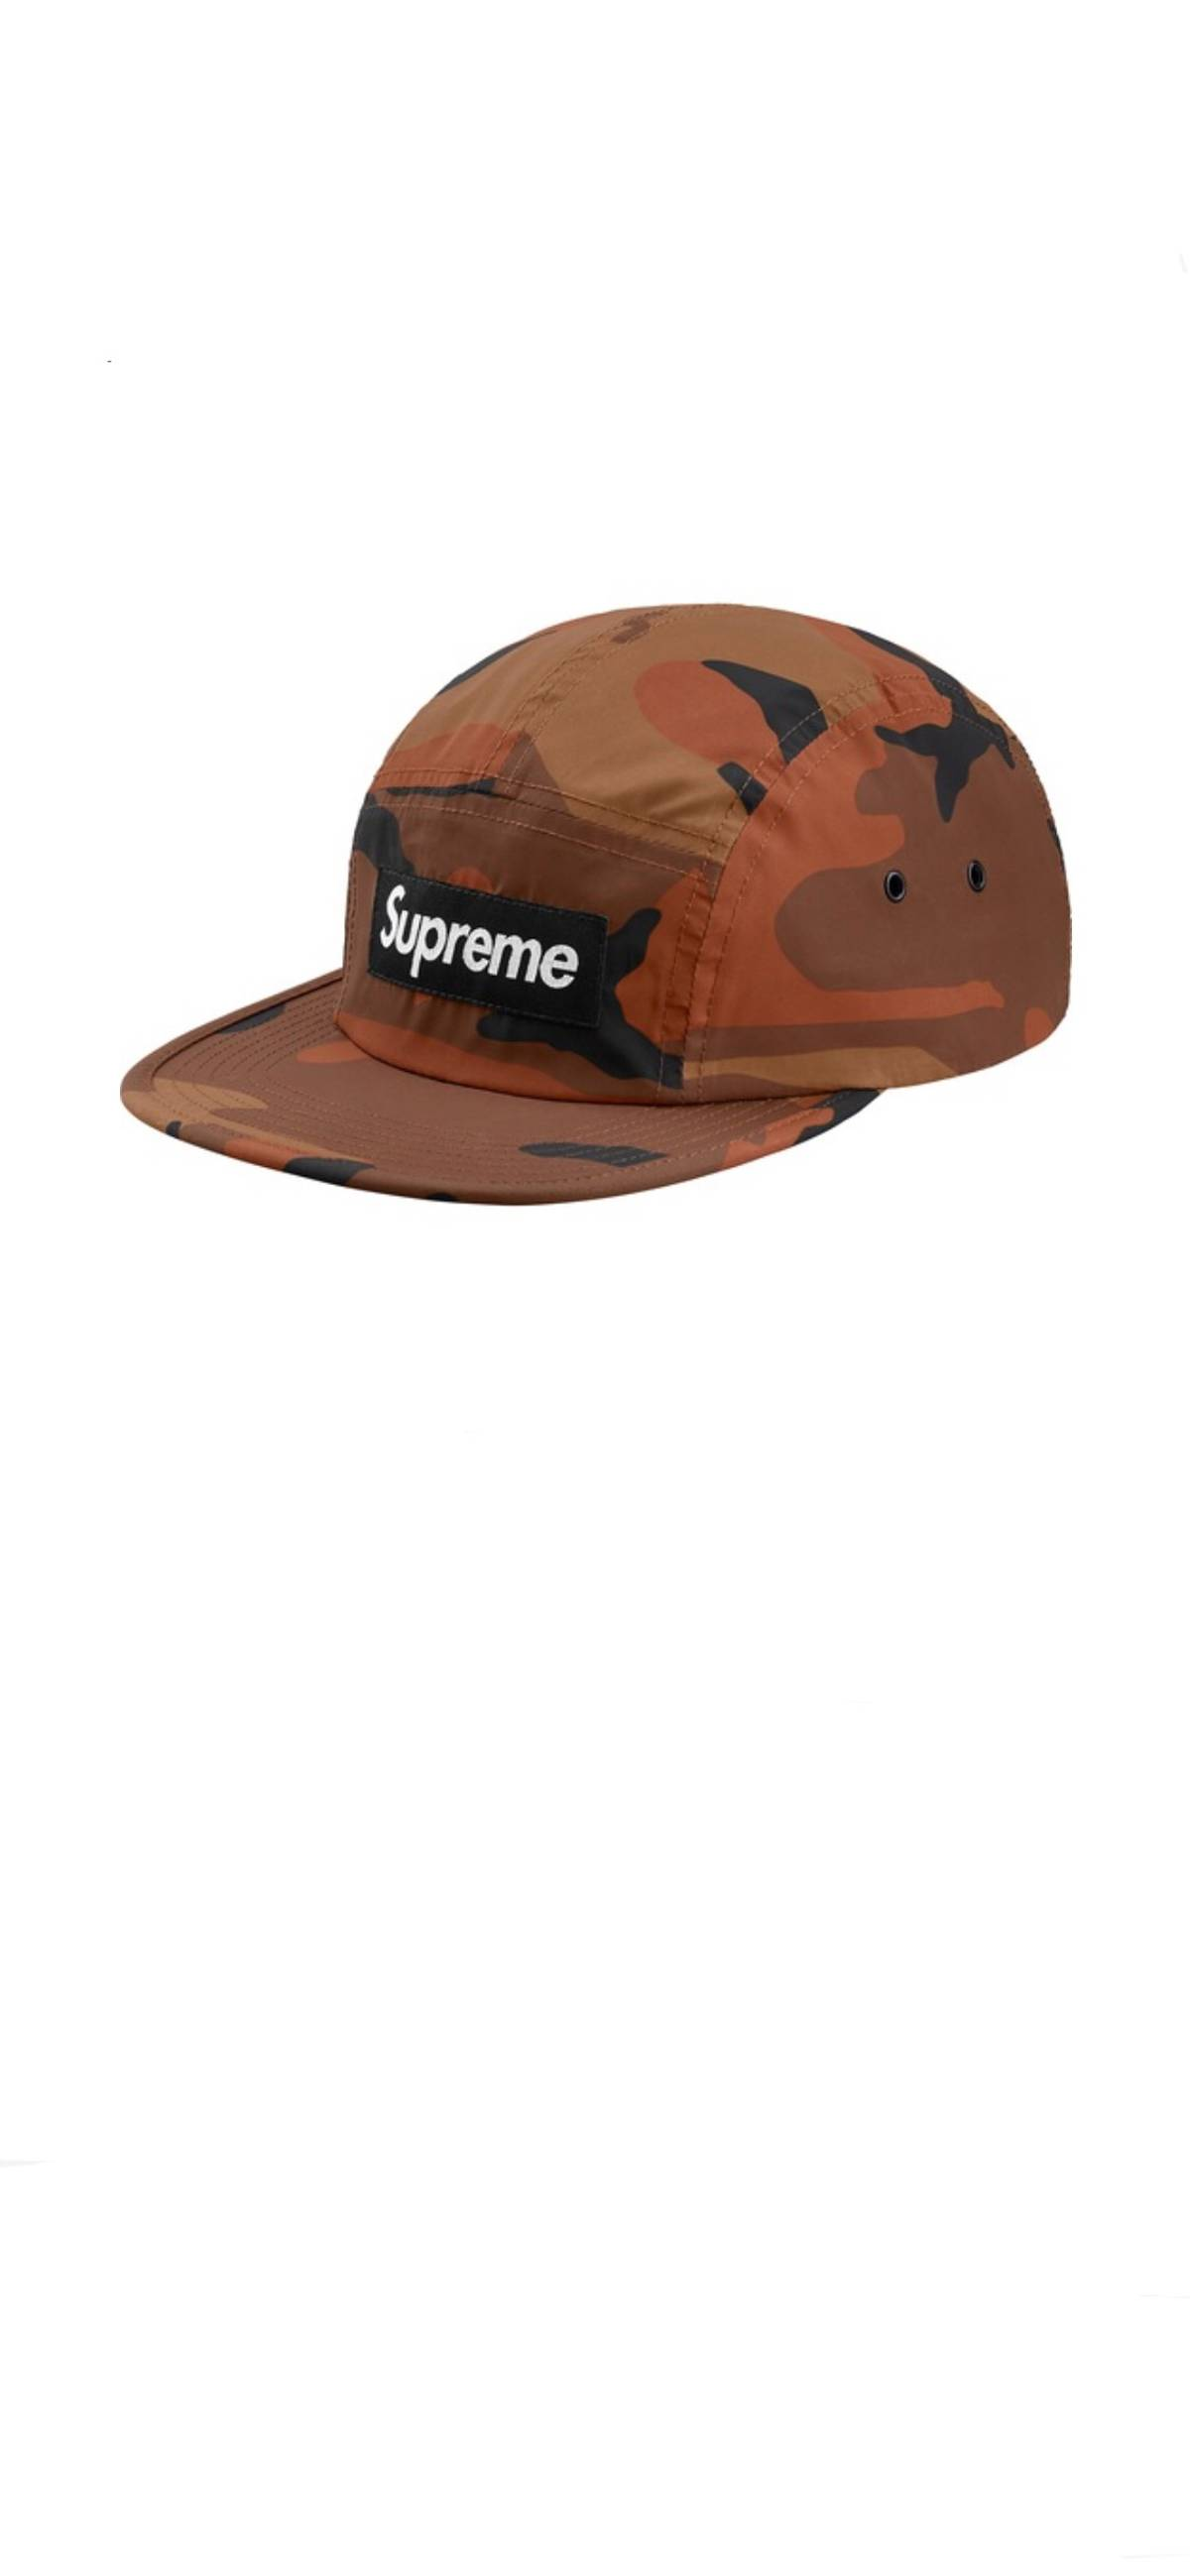 1f60211f1d7 Supreme Supreme Reflective Camo Camp Cap FW18 Orange Size one size - Hats  for Sale - Grailed